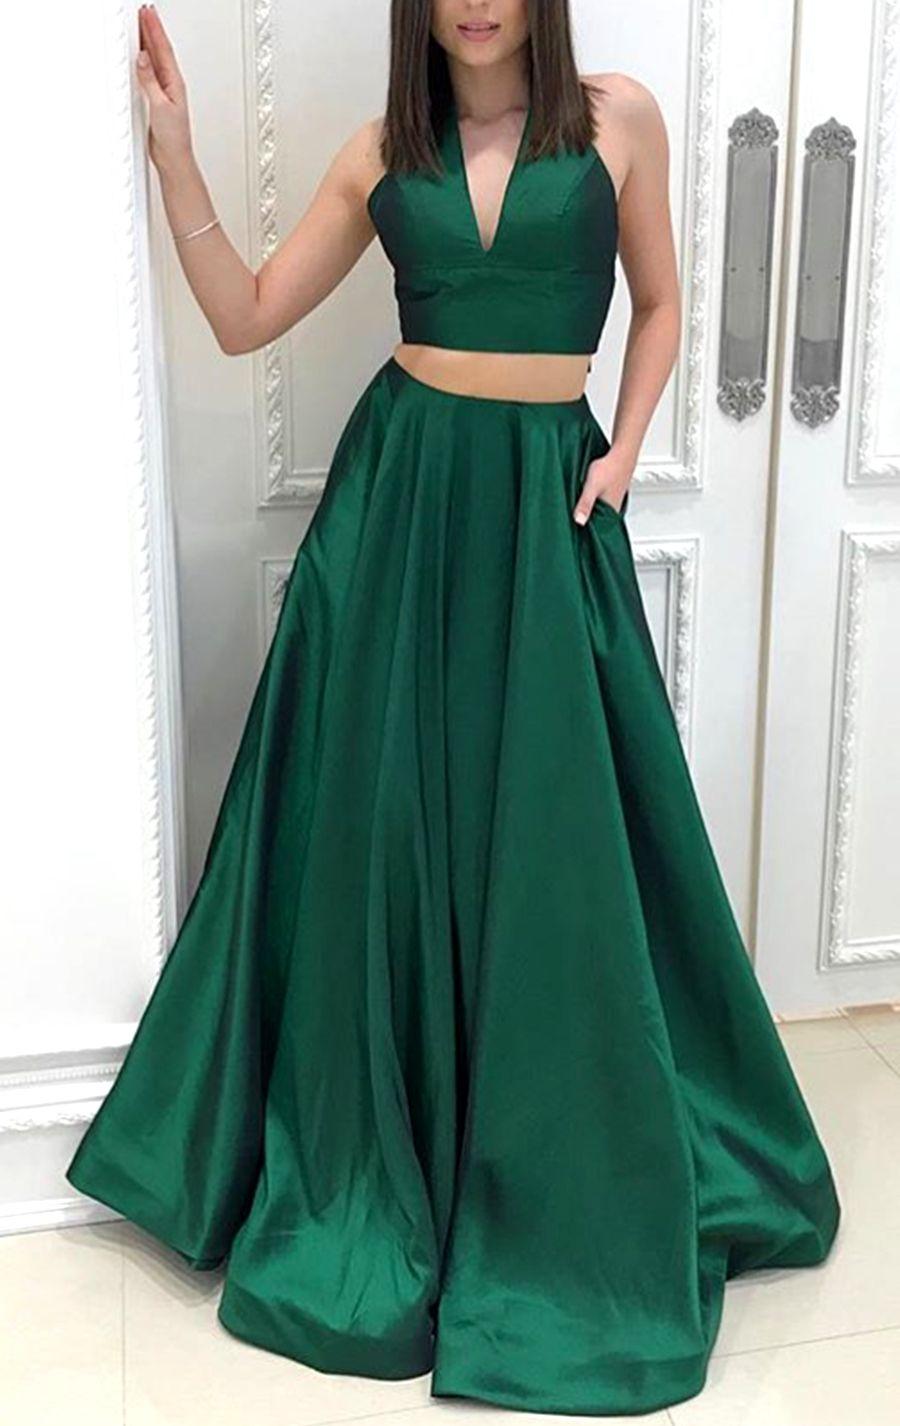 Halter v neck piece taffeta prom dress green formal evening gown